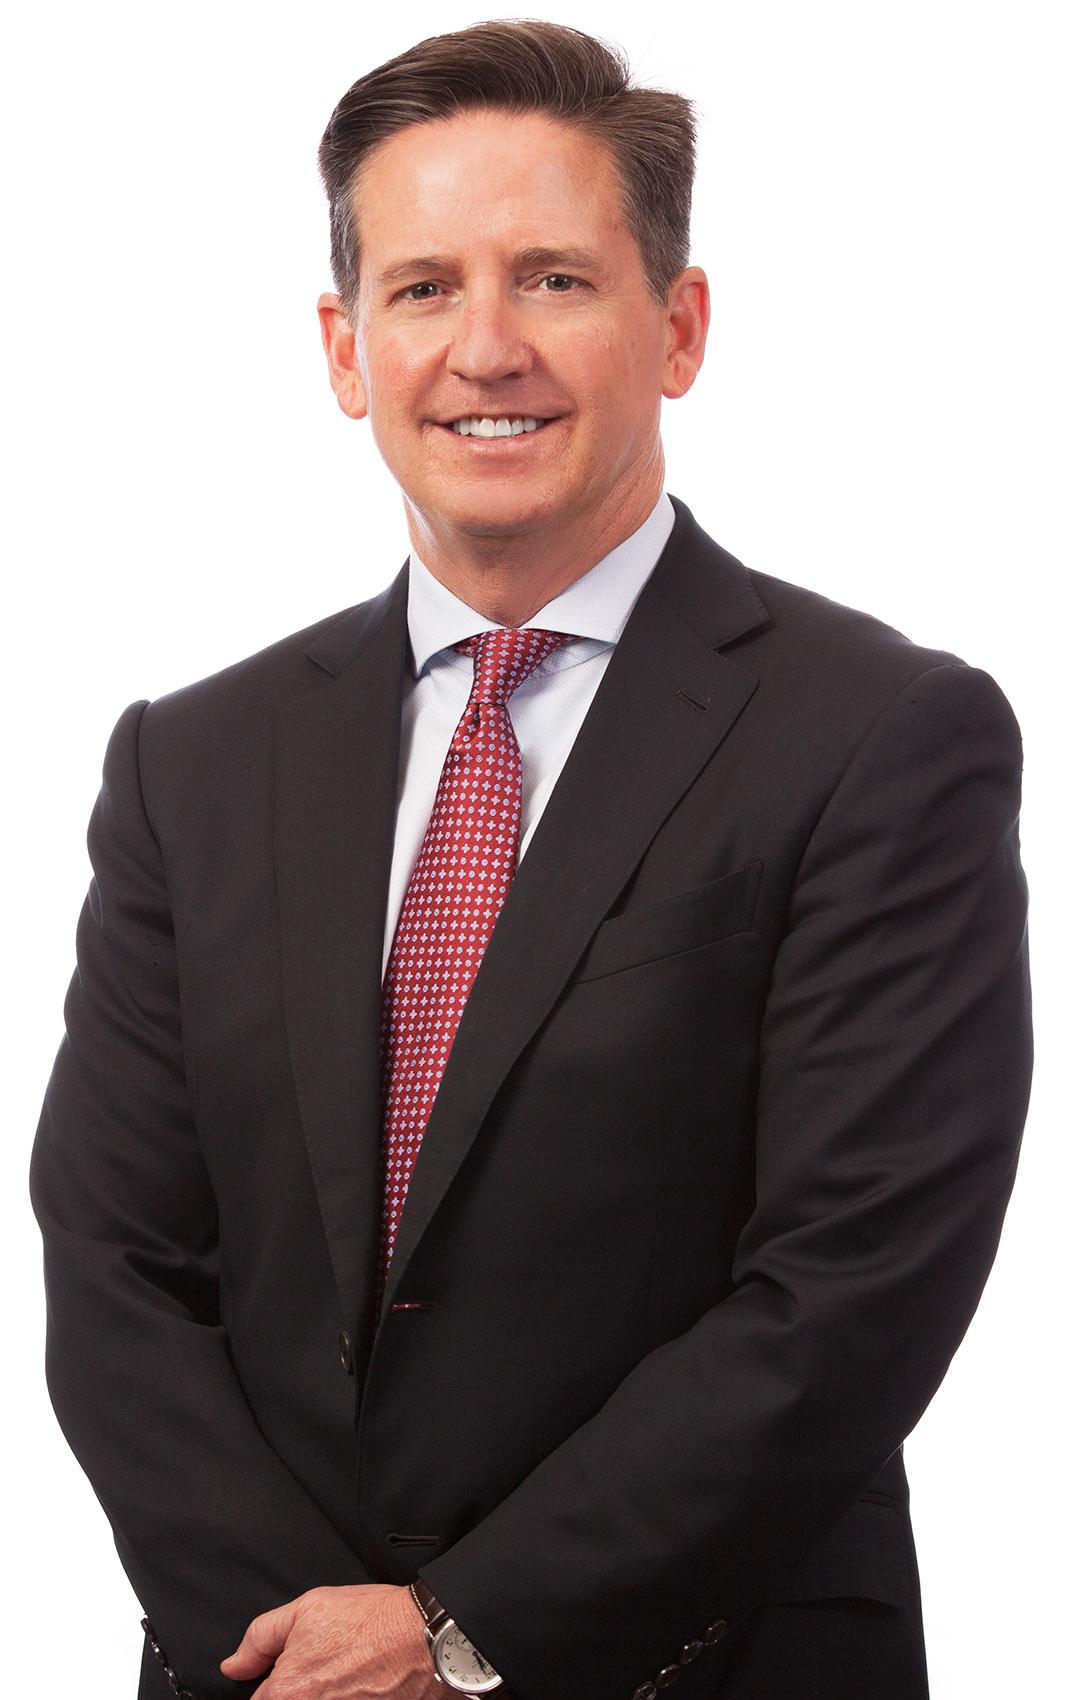 Daniel S. Sanders, Jr.